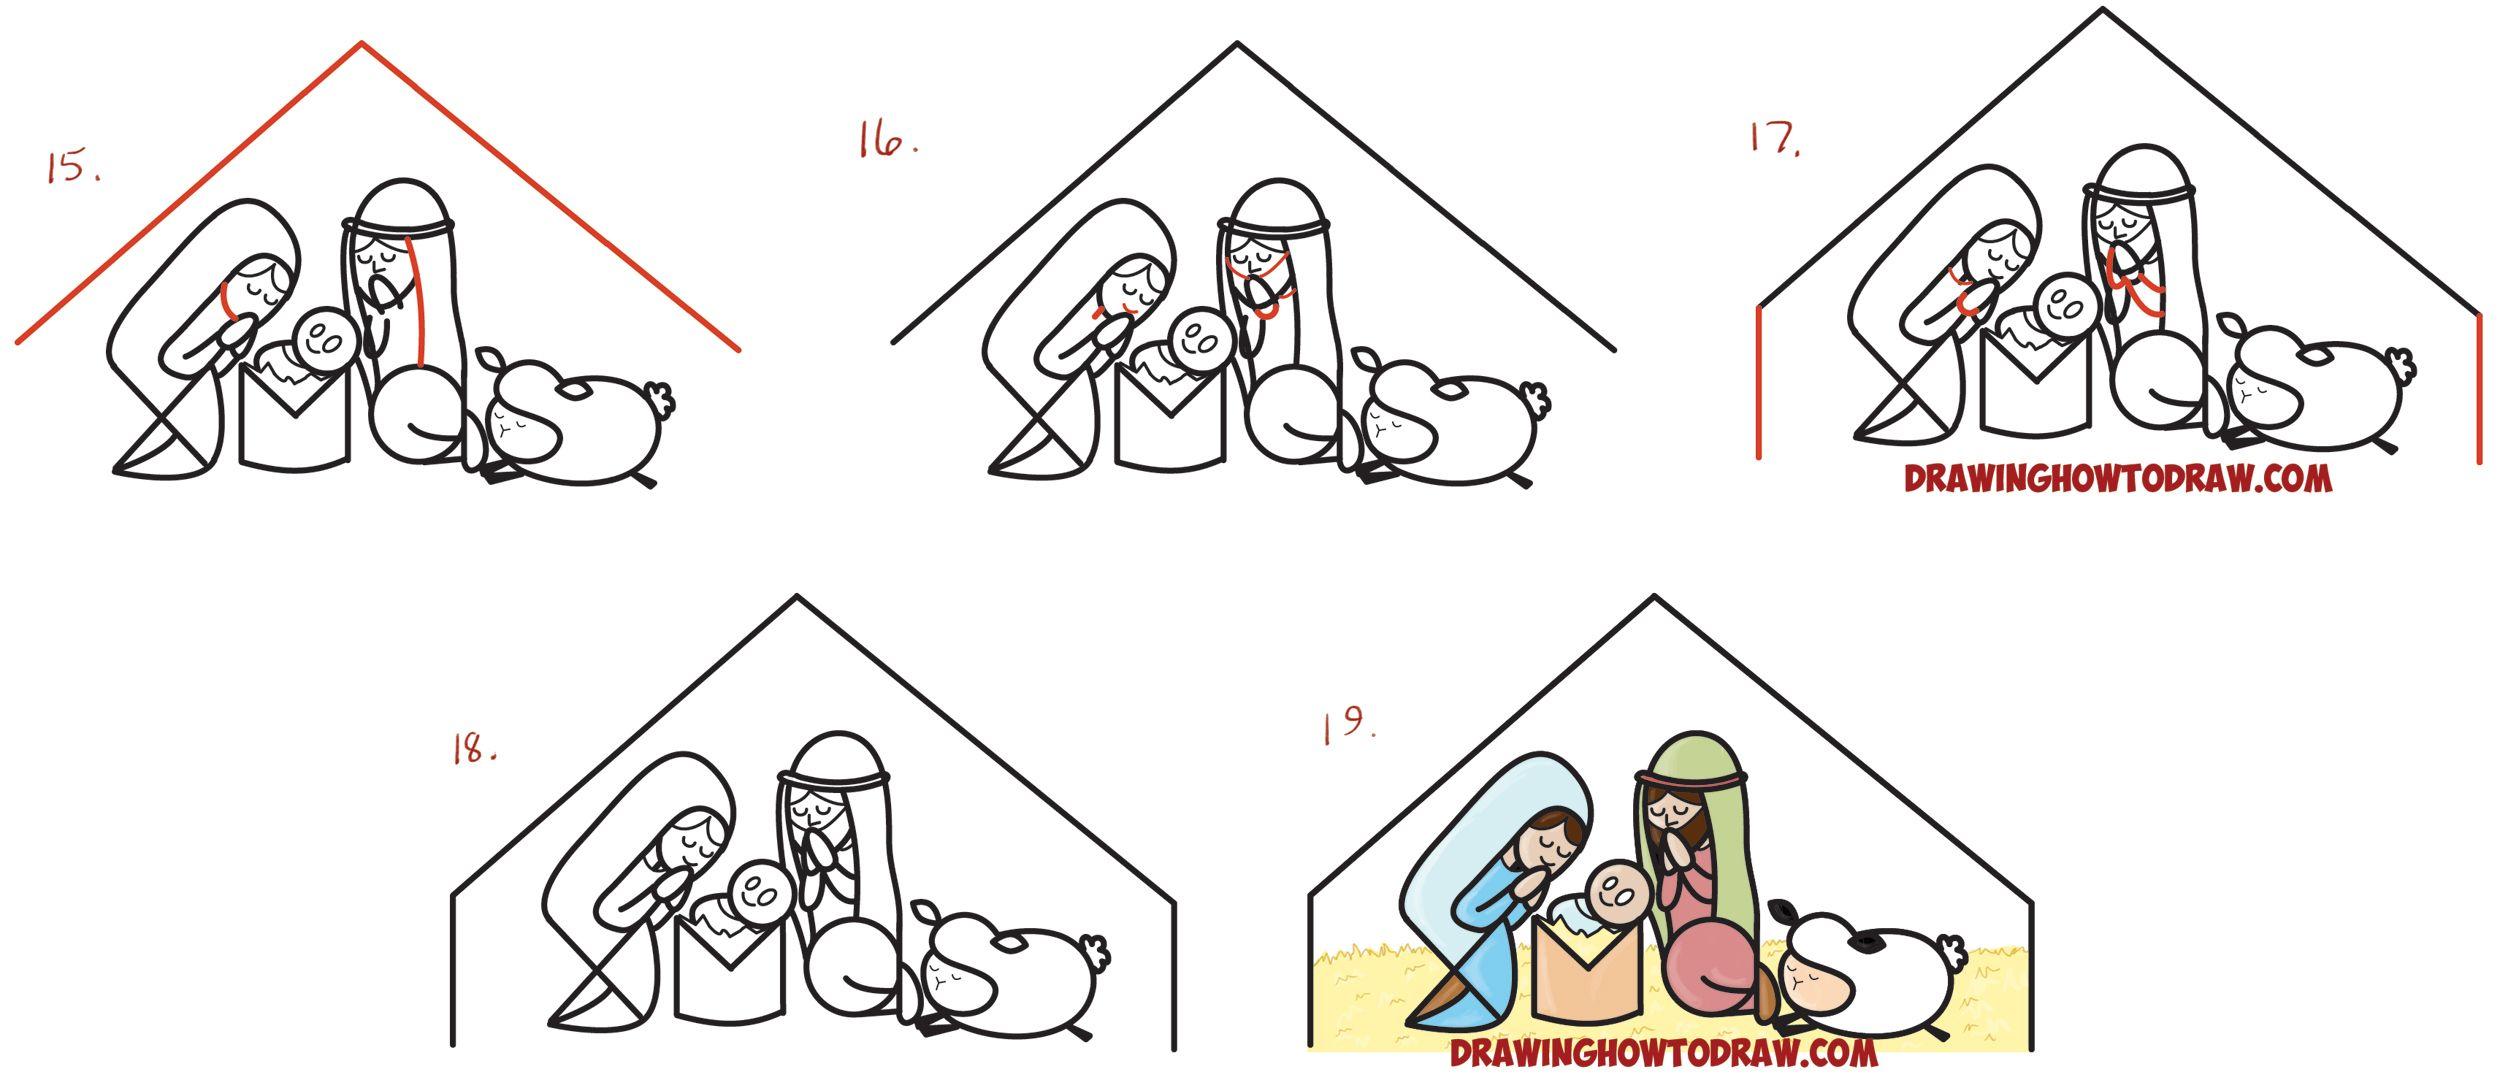 How to Draw Cartoon Nativity Scene with Mary, Jesus, and ...